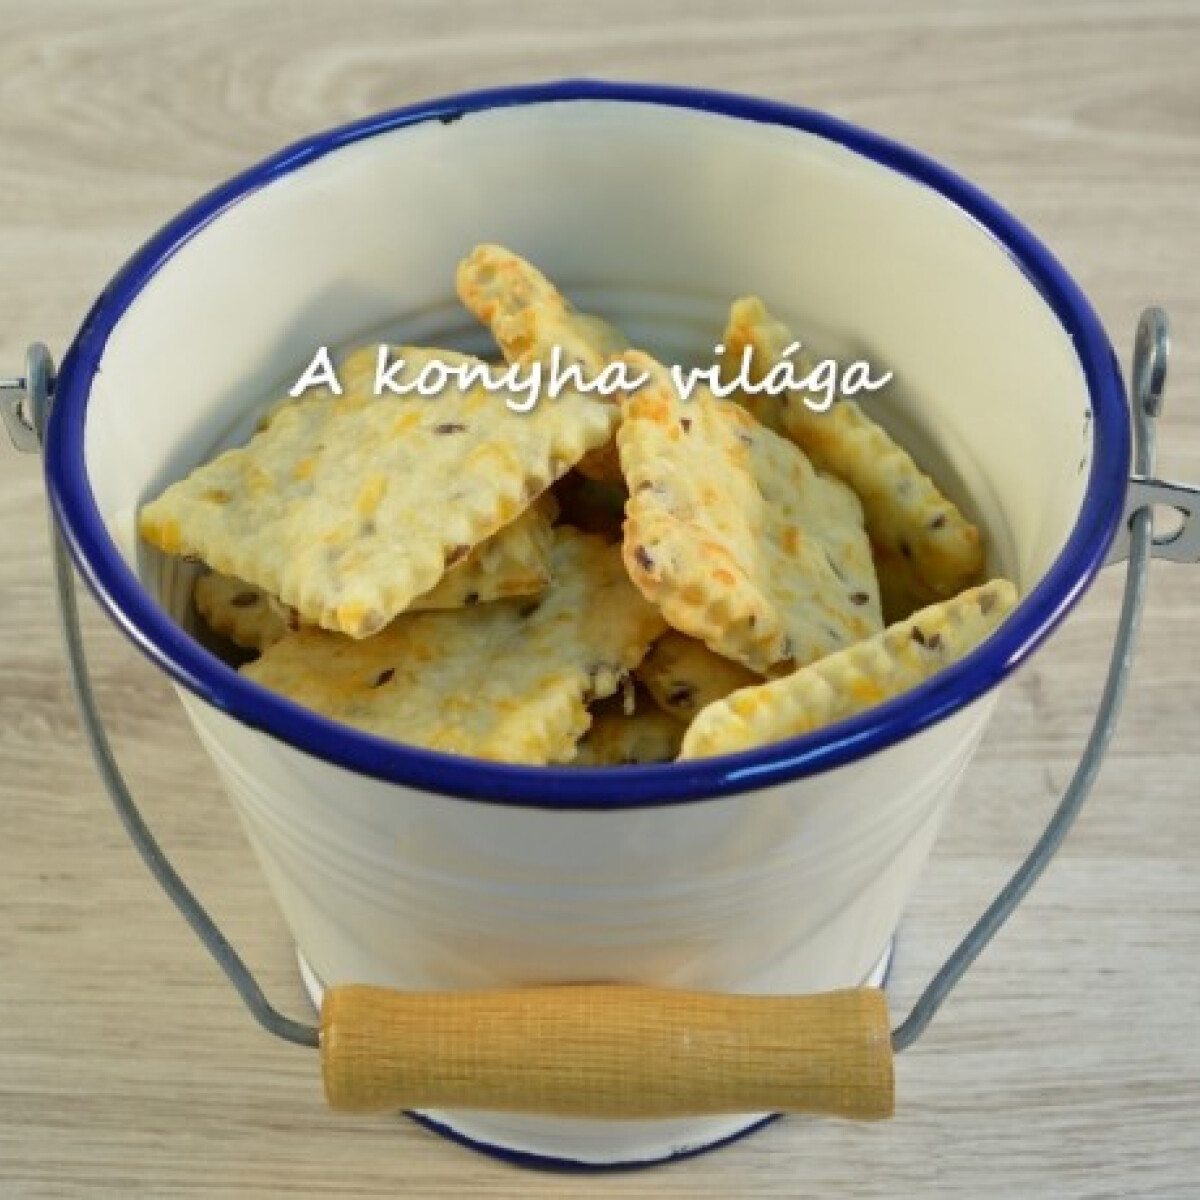 Cheddar sajtos keksz